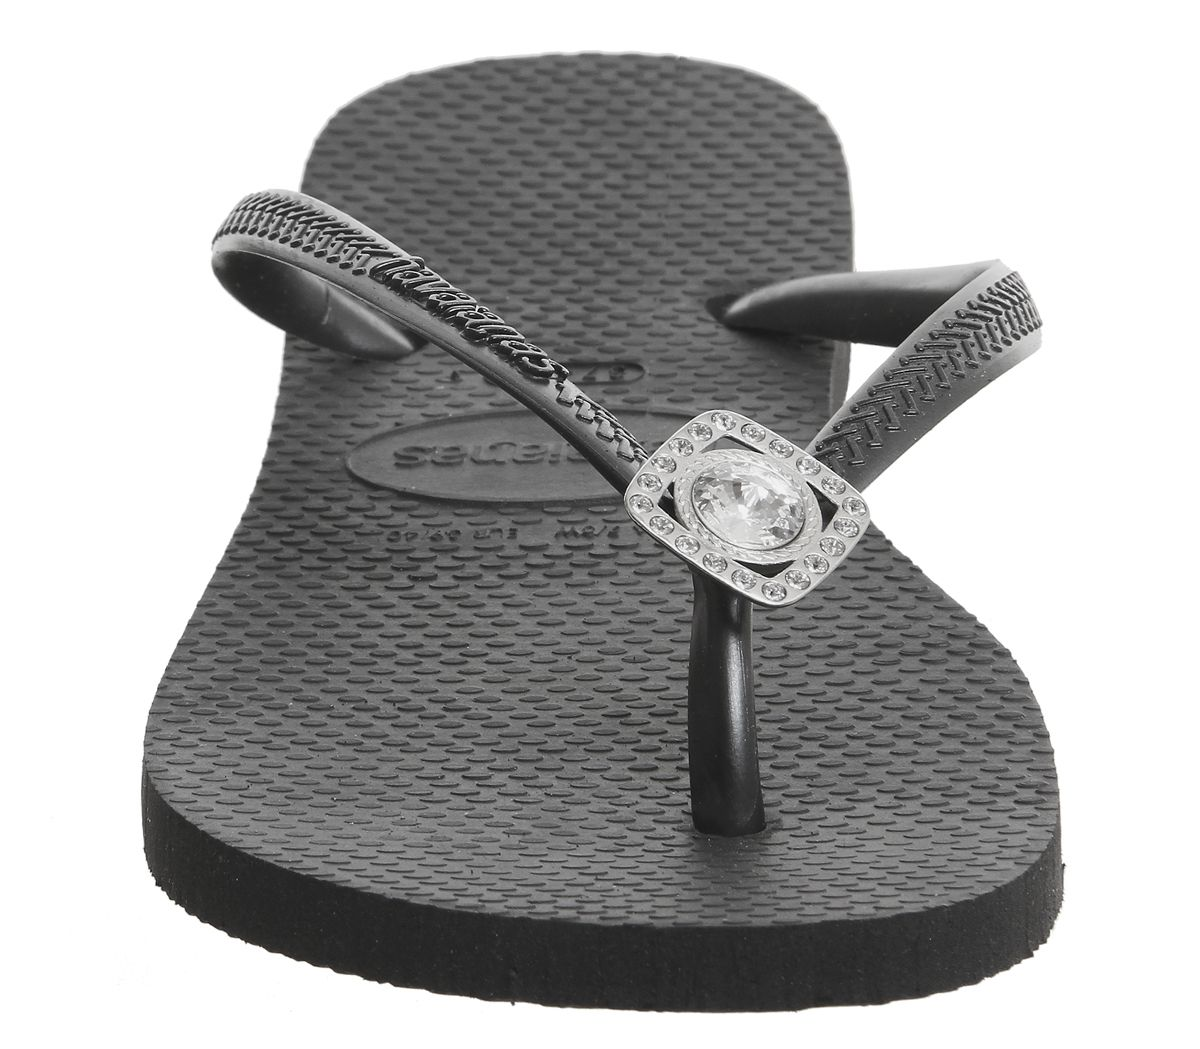 ff9898138f07 Havaianas Slim Crystal Poem Flip Flops Black - Sandals